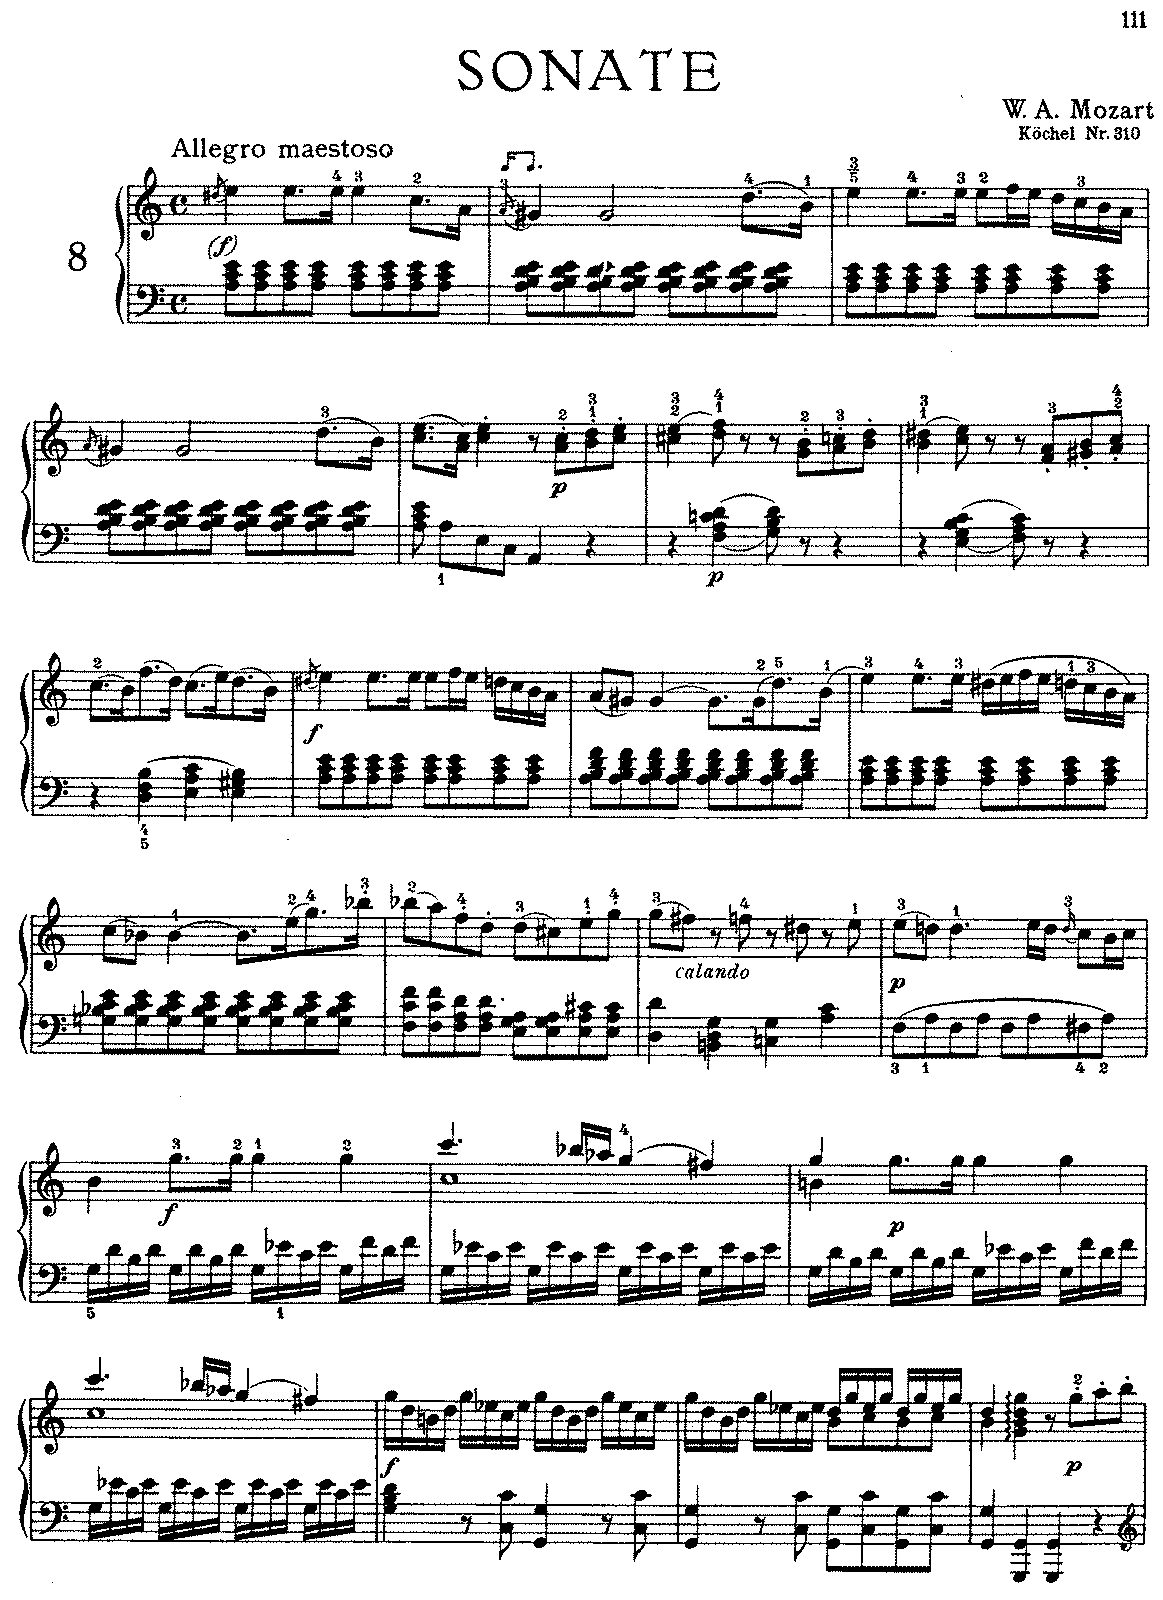 Partitura da Sonata para piano n. 8 em Lá menor, K.310 (Piano Sonata ...